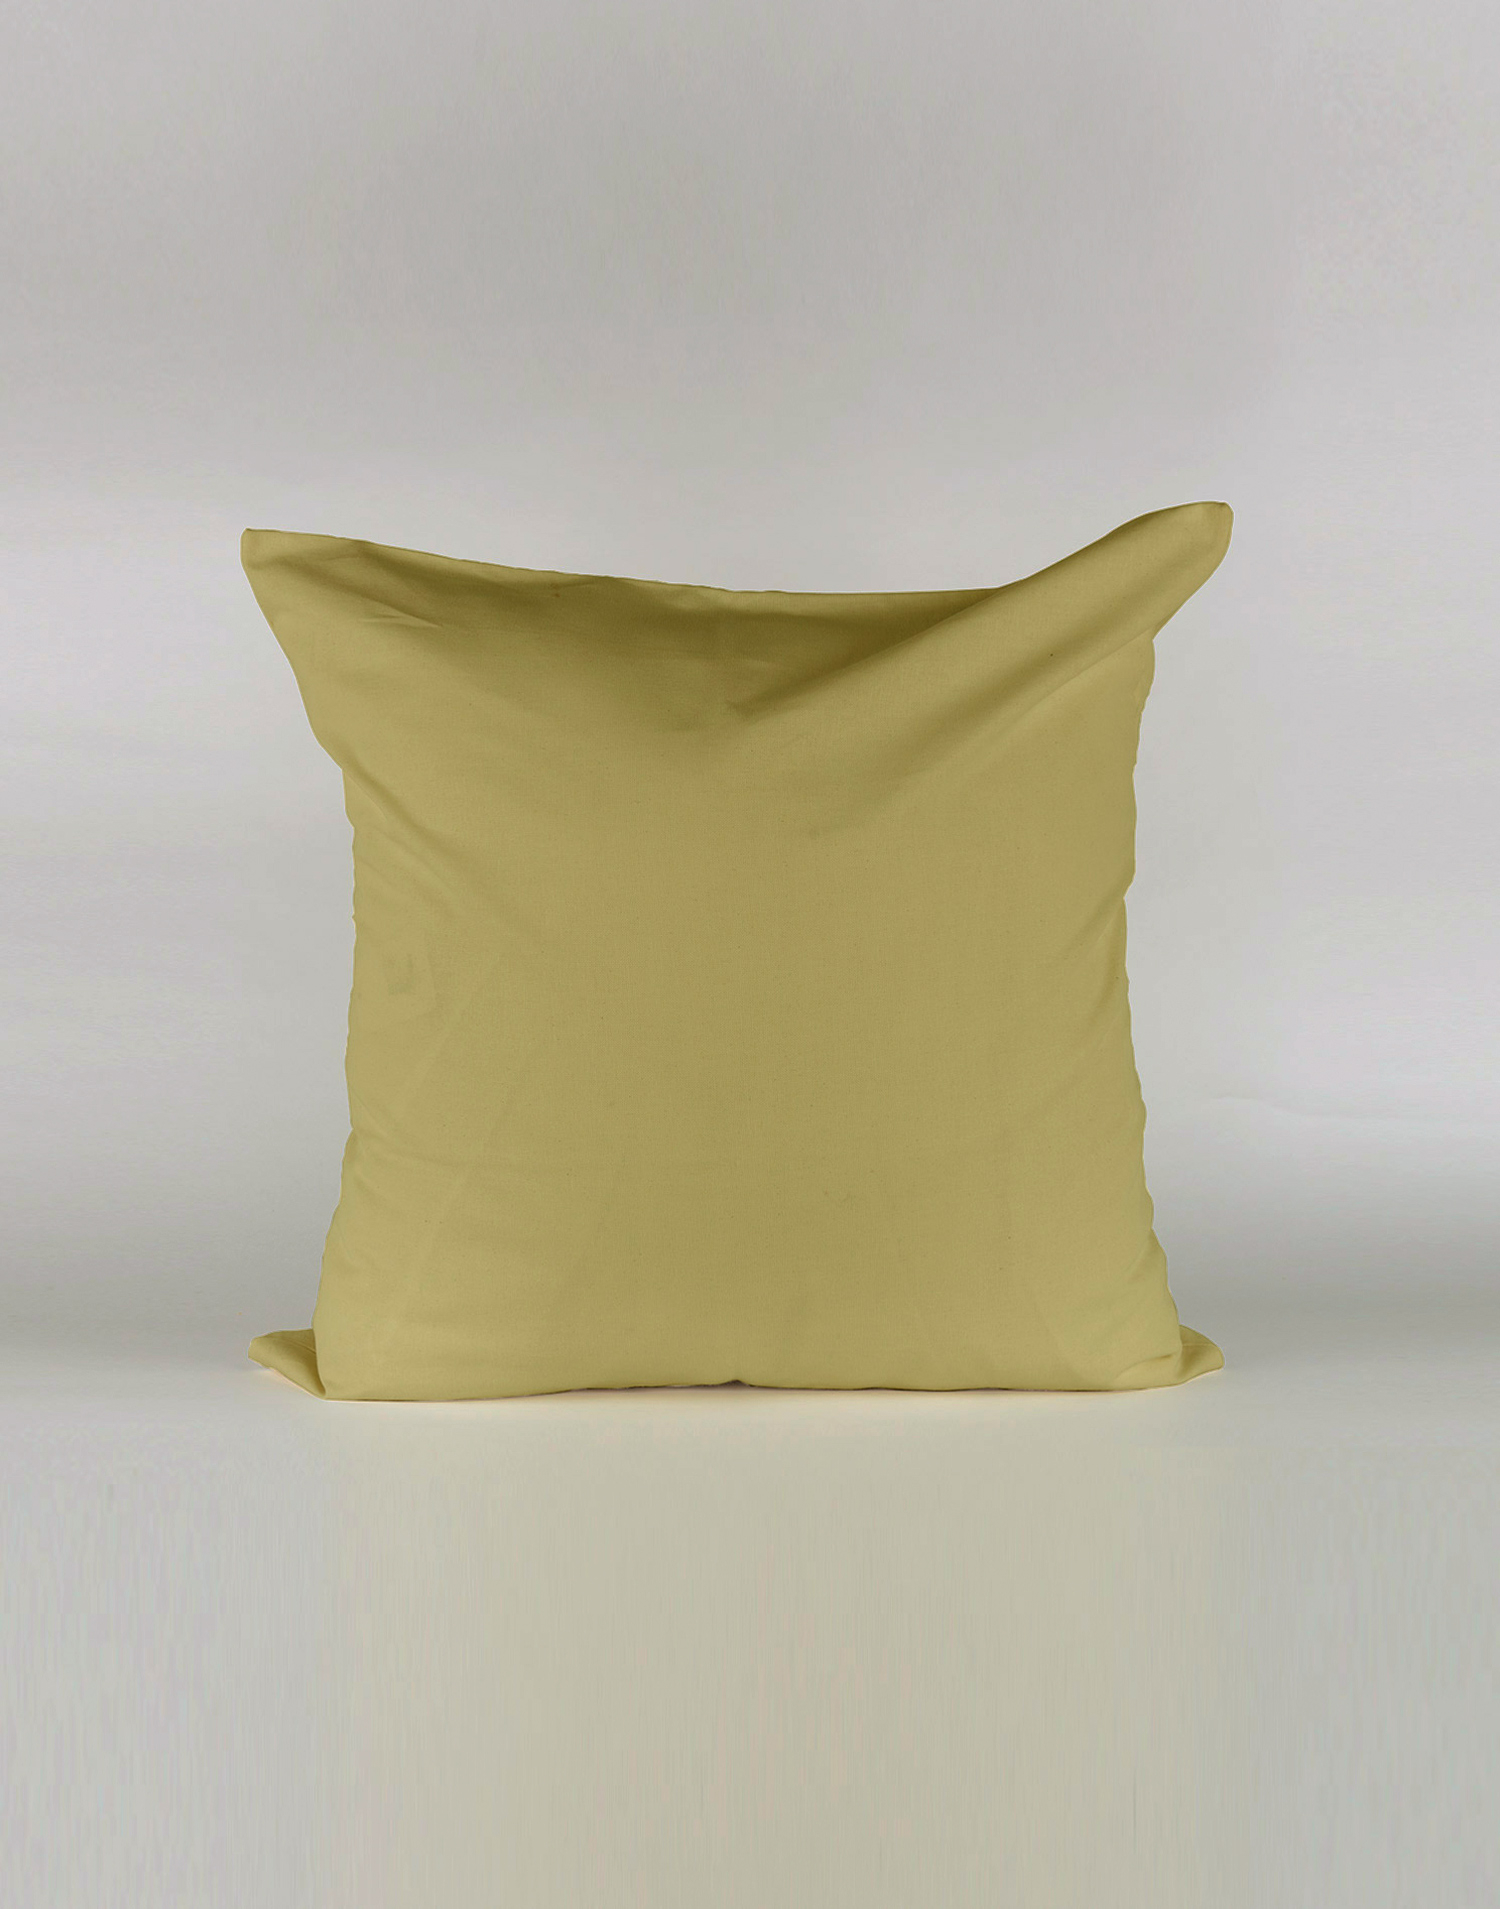 Panama cushion cover 45 x 45 cm